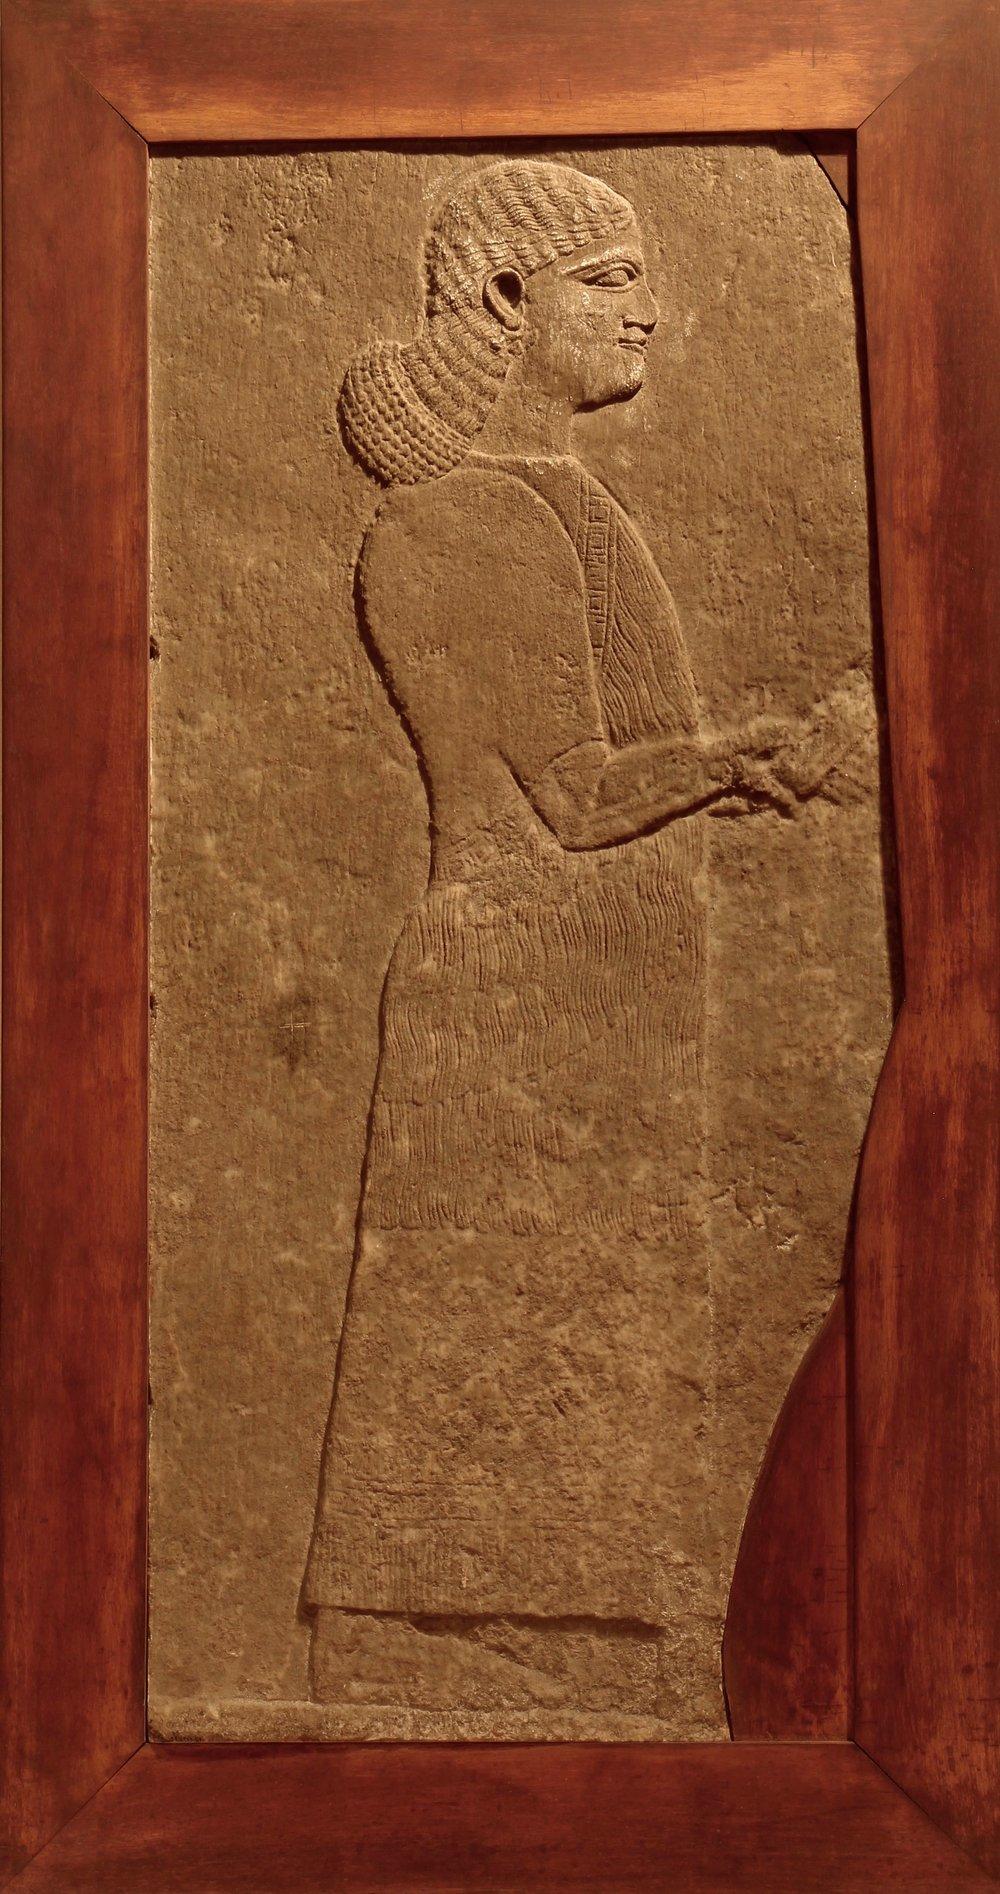 Figure 3: A eunuch royal attendant, Central Palace of Tiglath-Pileser III, Nimrud, Iraq. (09.SP.1551; 89.5 x 42 cm)